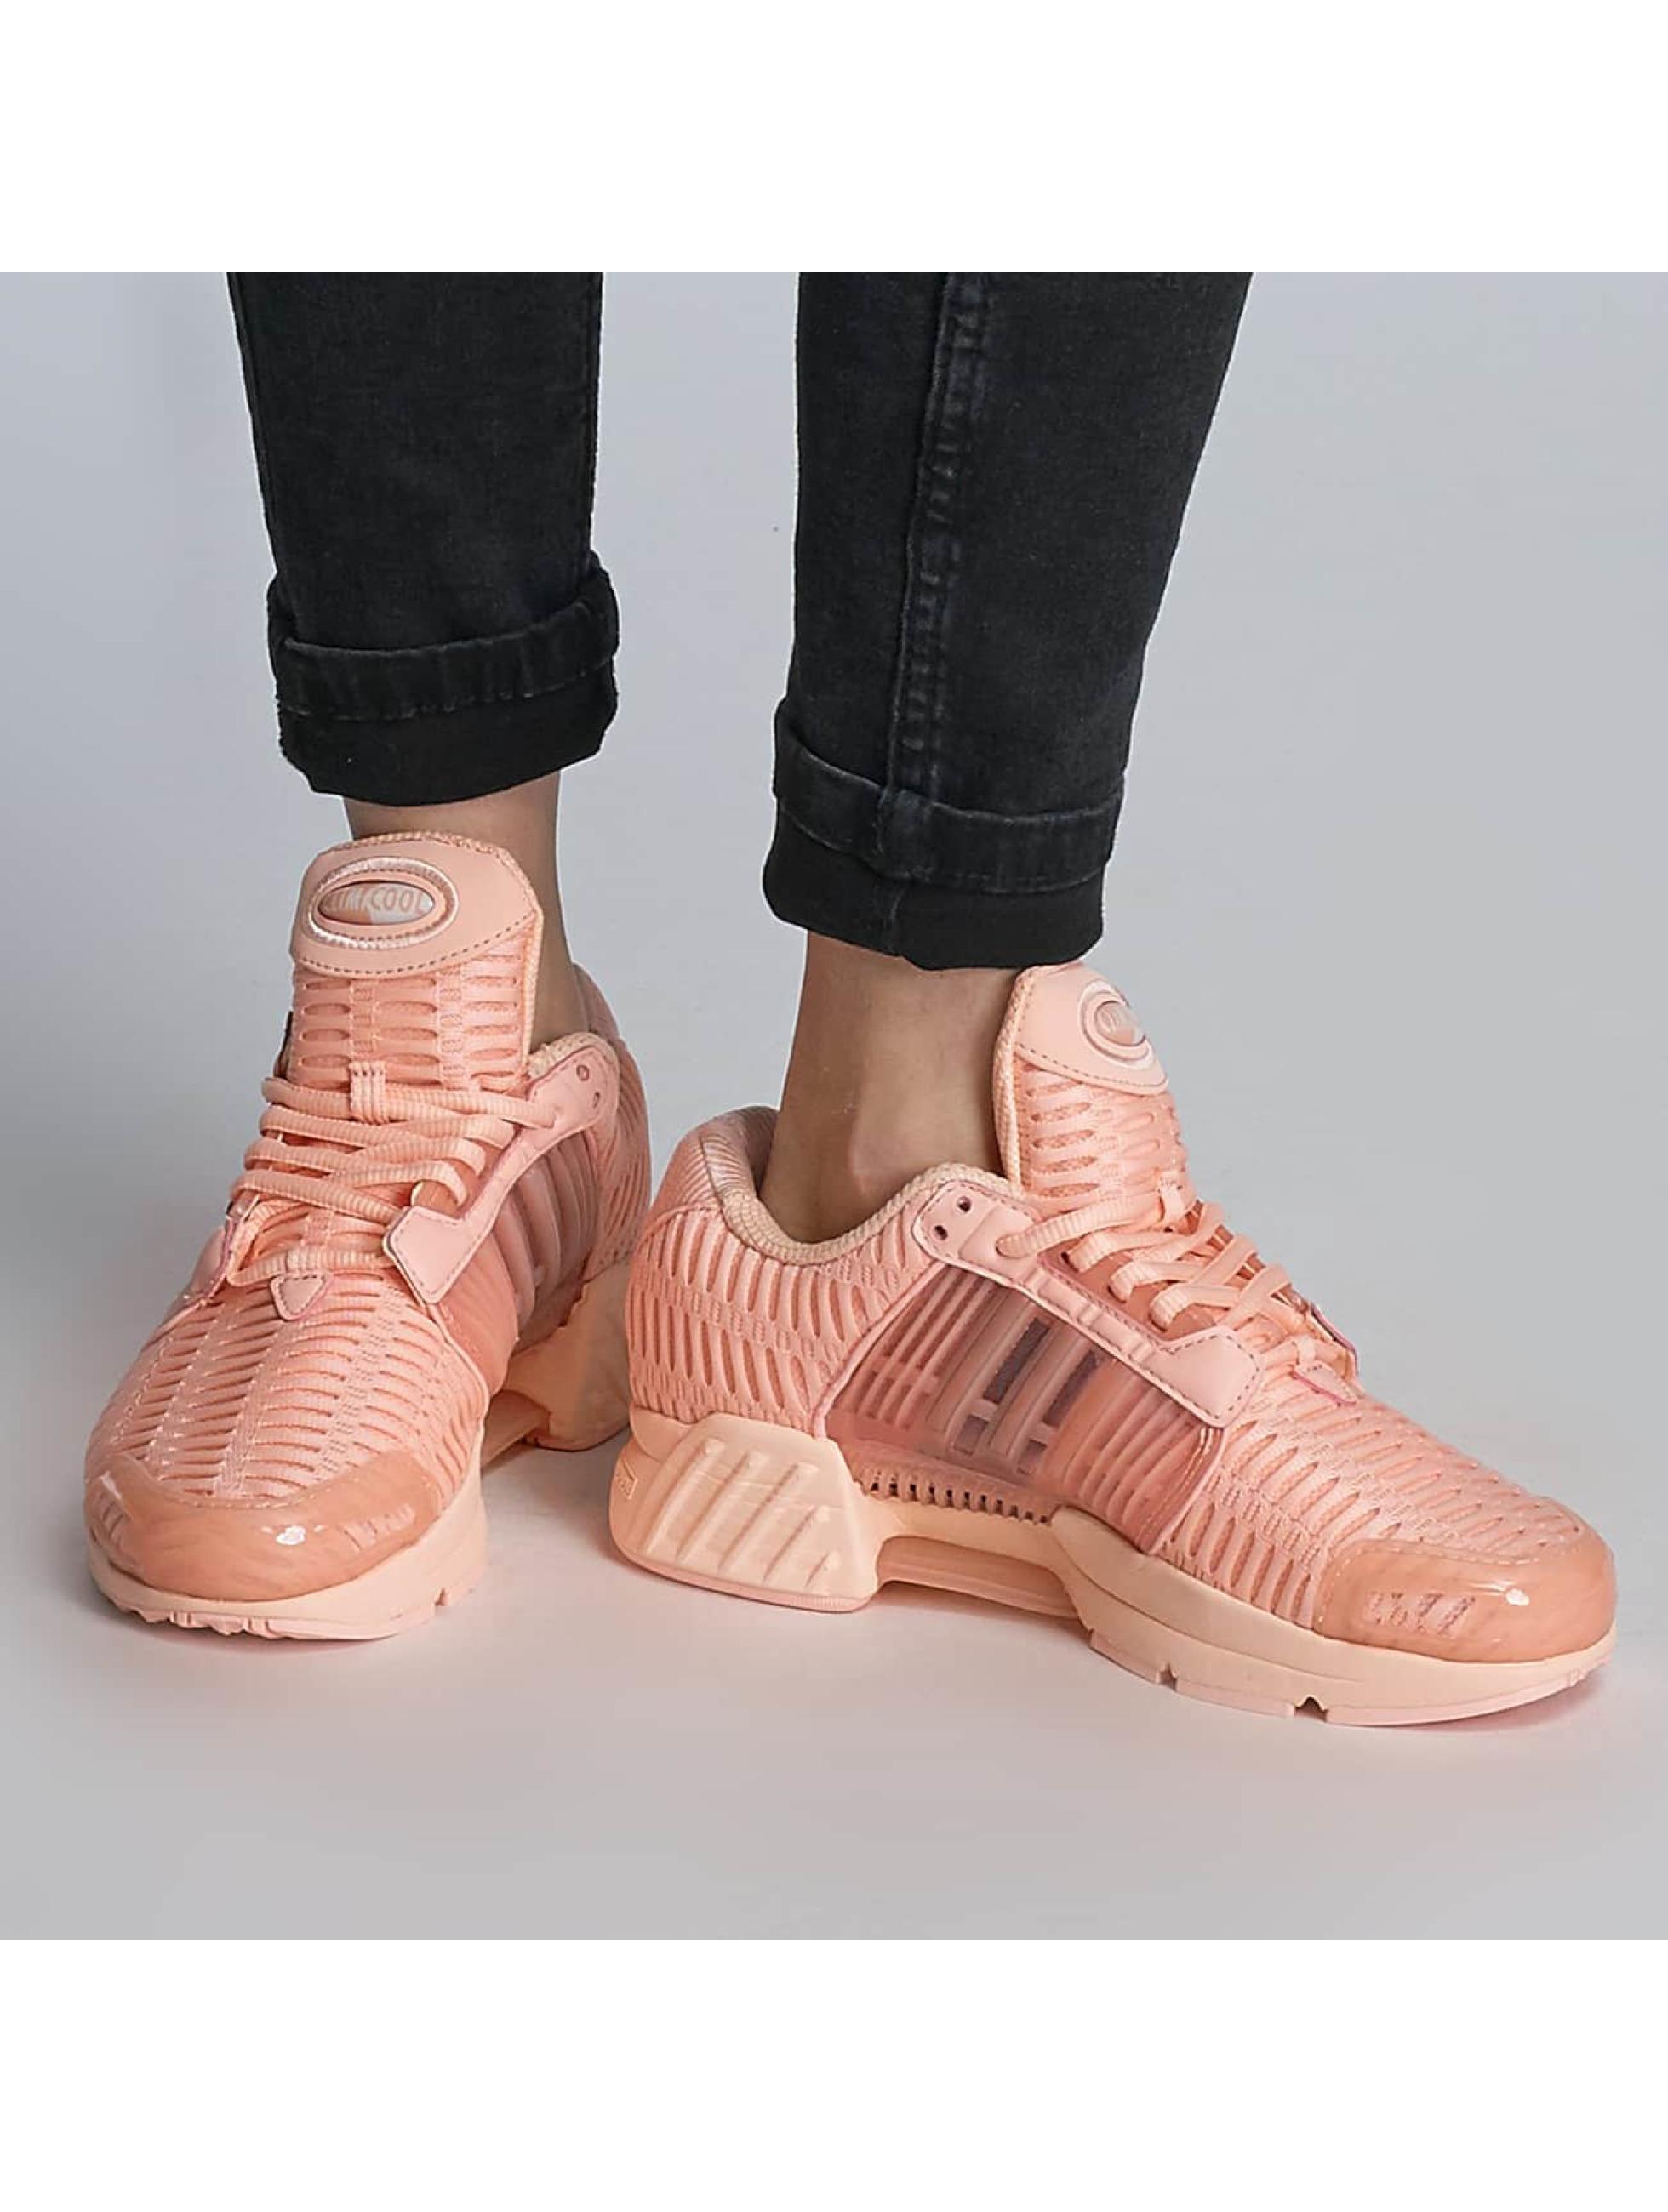 adidas Sneakers Climacool orange